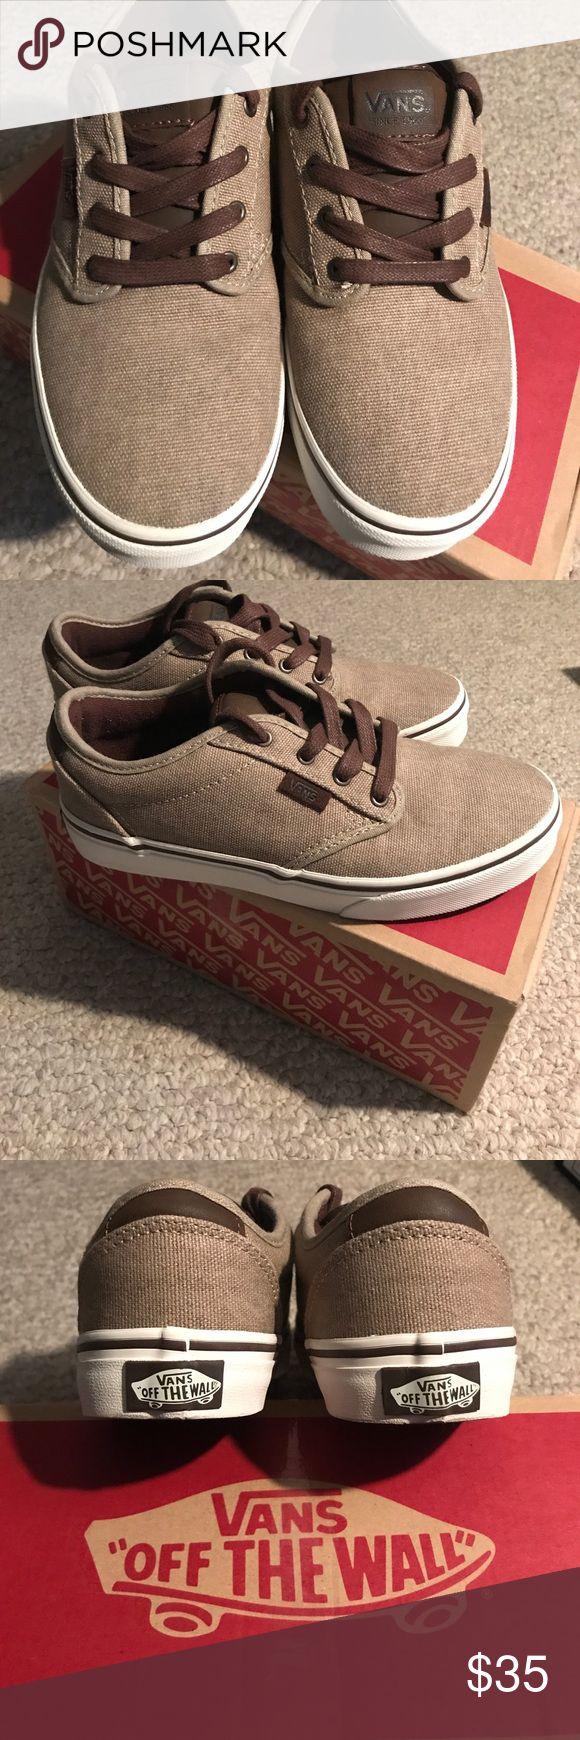 Boys Vans Shoes BRAND NEW Boys brown van shoes. Bought and never worn! Original box. Vans Shoes